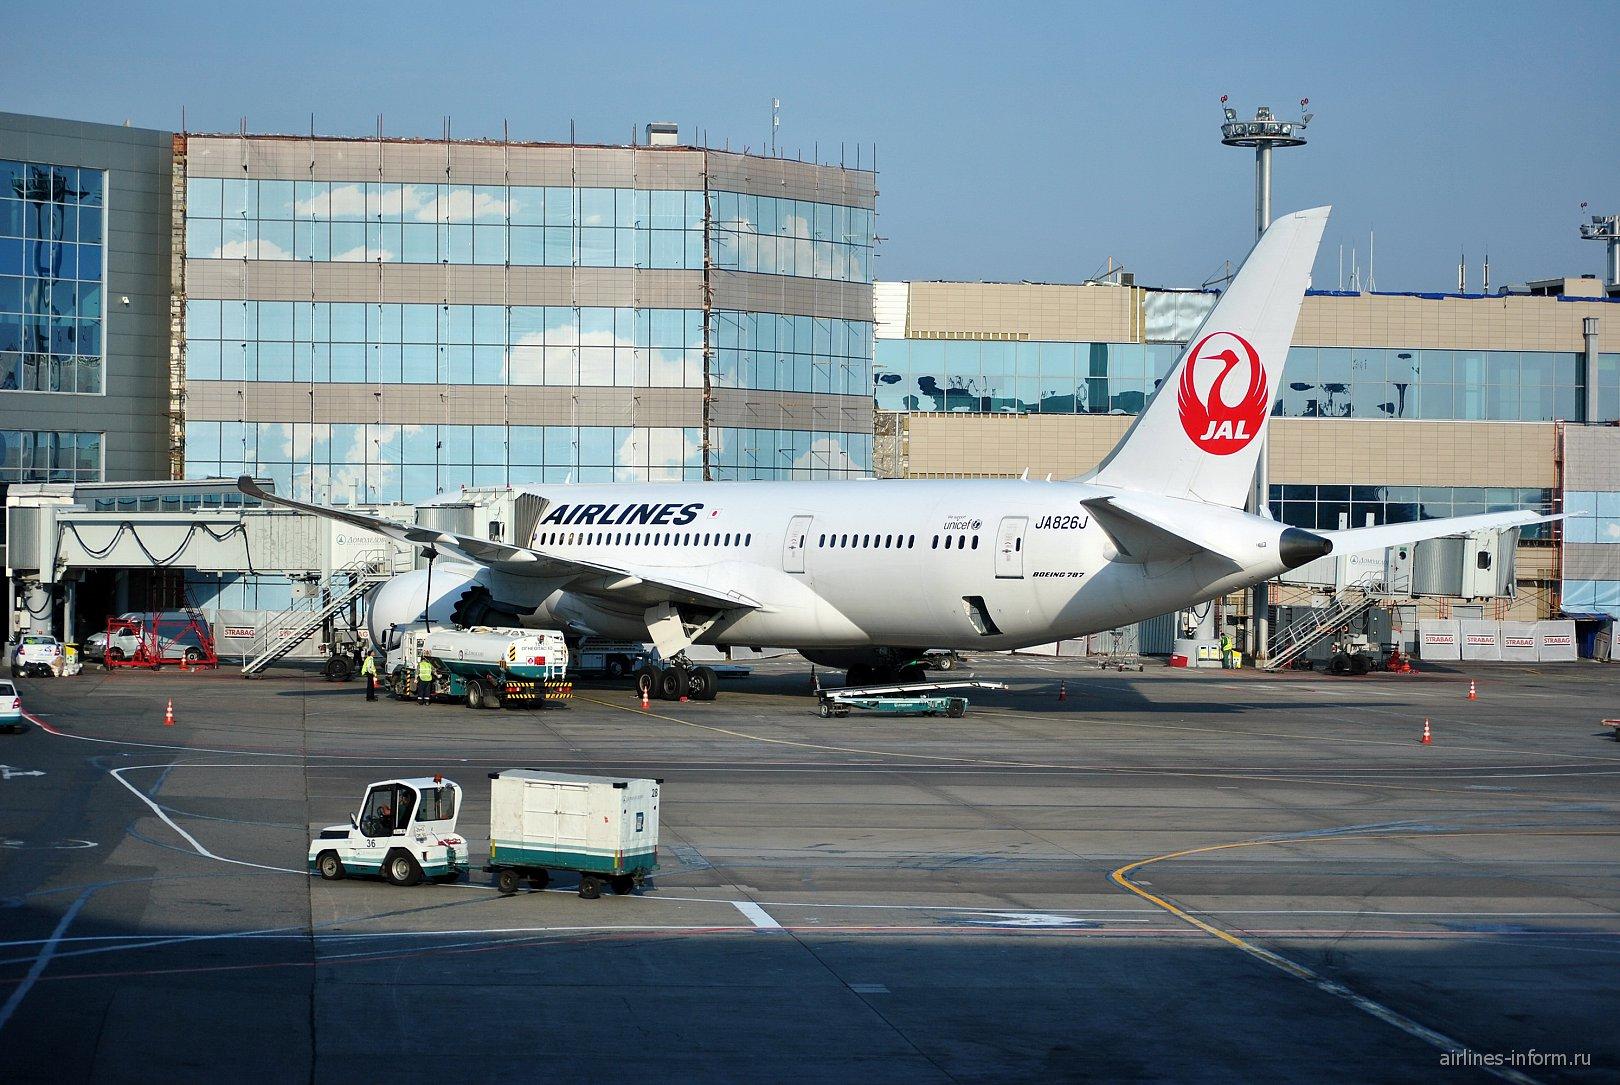 Боинг-787-8 Японских авиалиний в аэропорту Домодедово